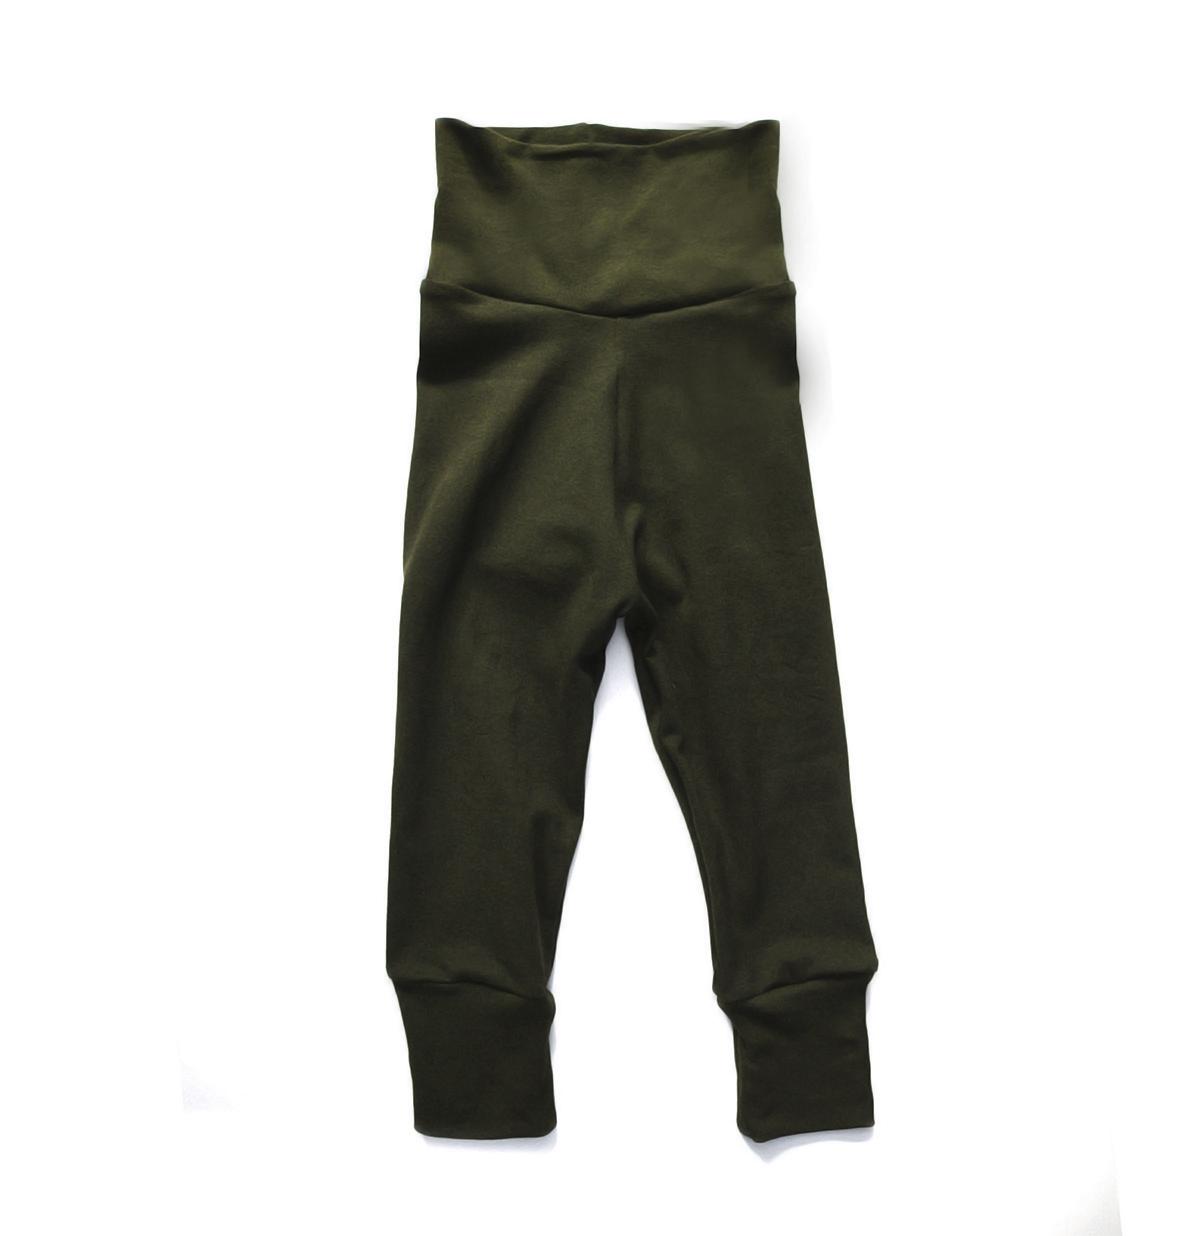 Little Sprout Pants™ Olive - Regular Fit 00504